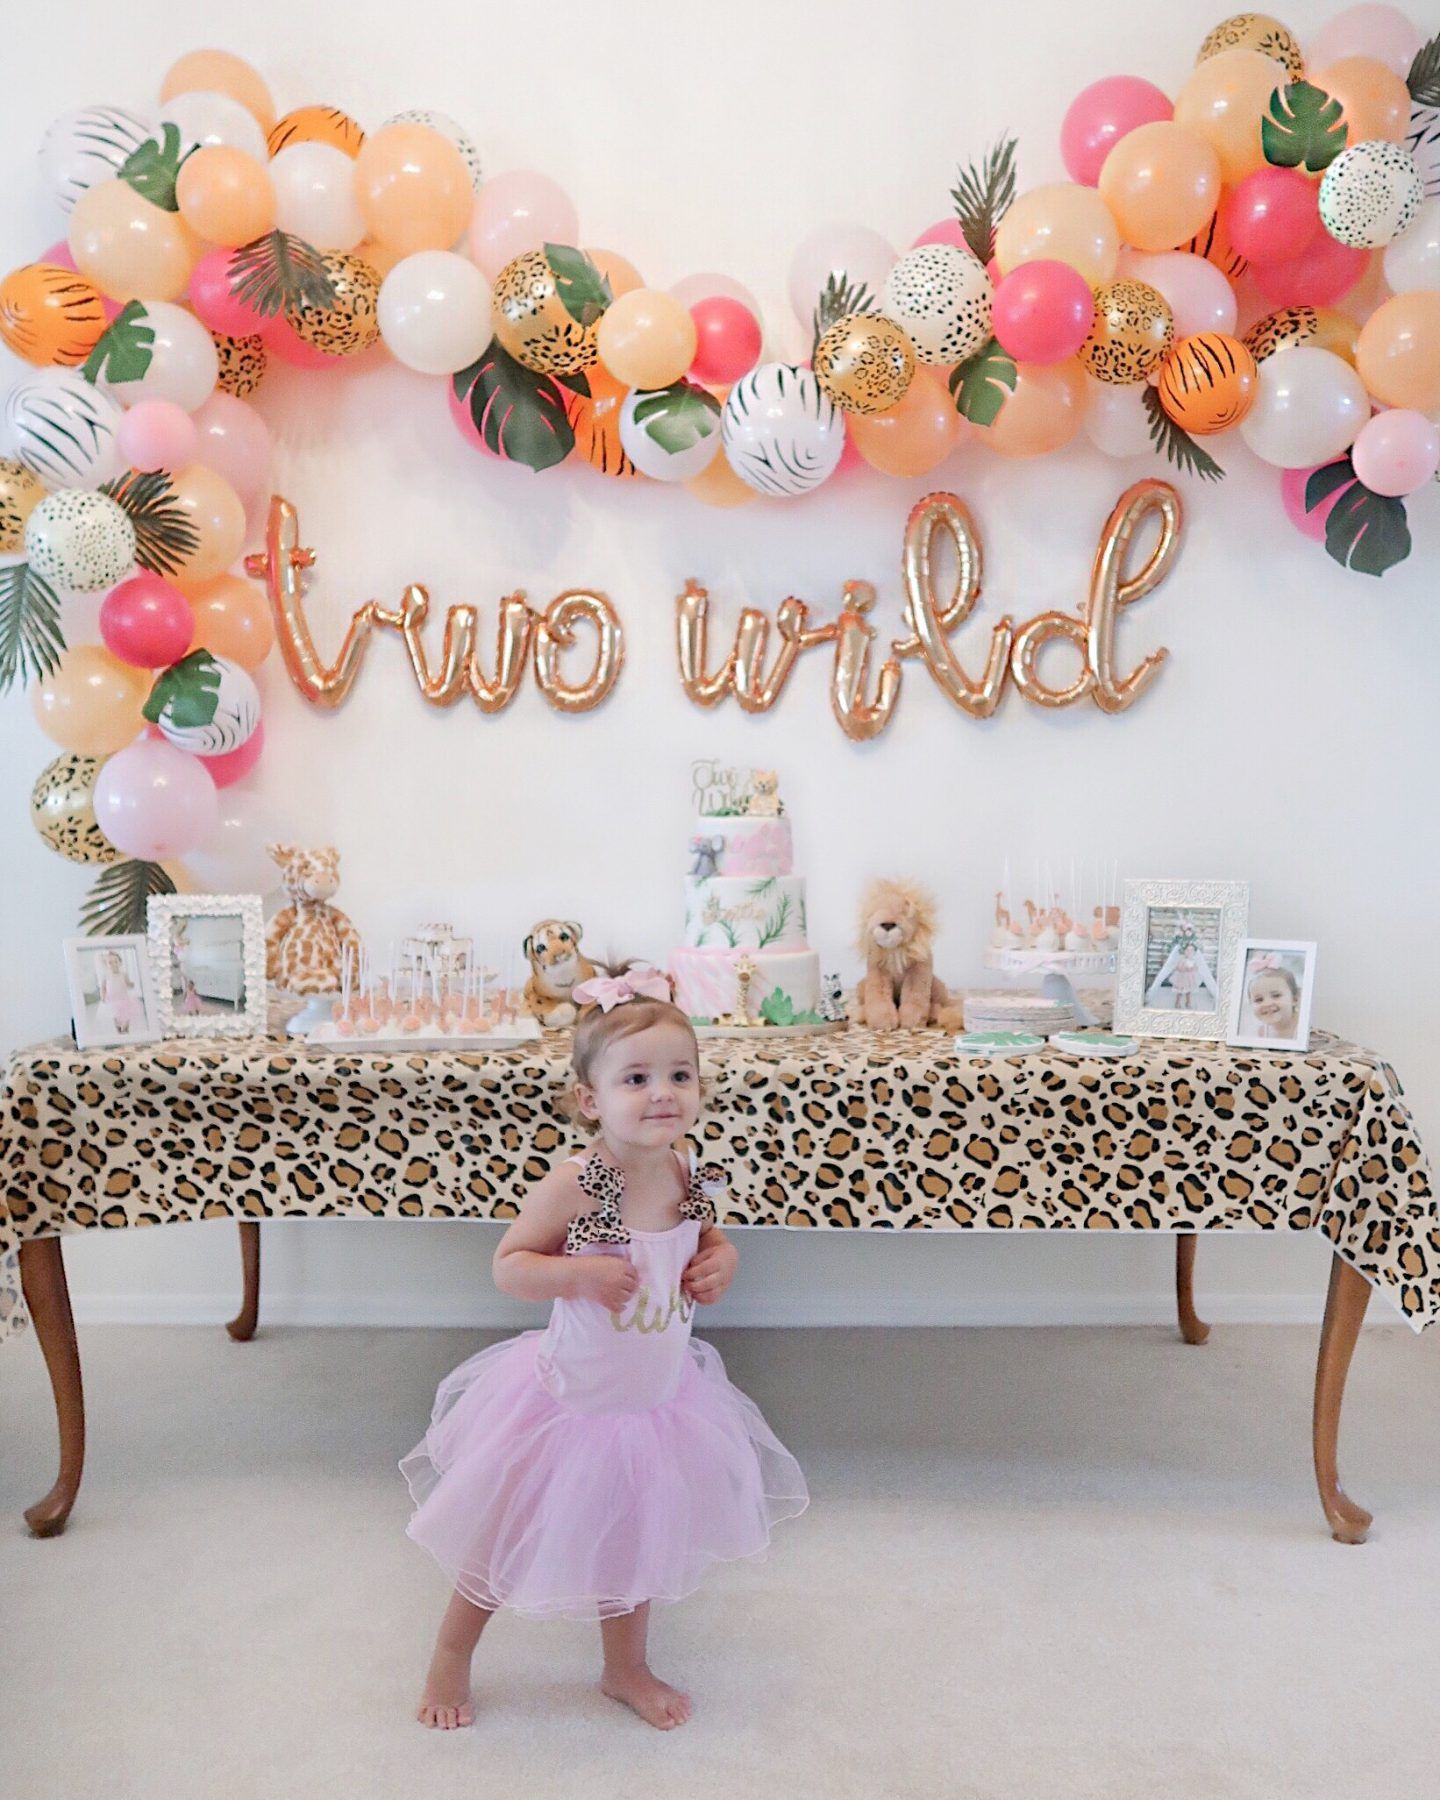 Brie Bemis Rearick Safari Girl Birthday Party Summer Tropical Inspiration 2nd Birthday Party For Girl Girls Birthday Party Themes Wild Birthday Party